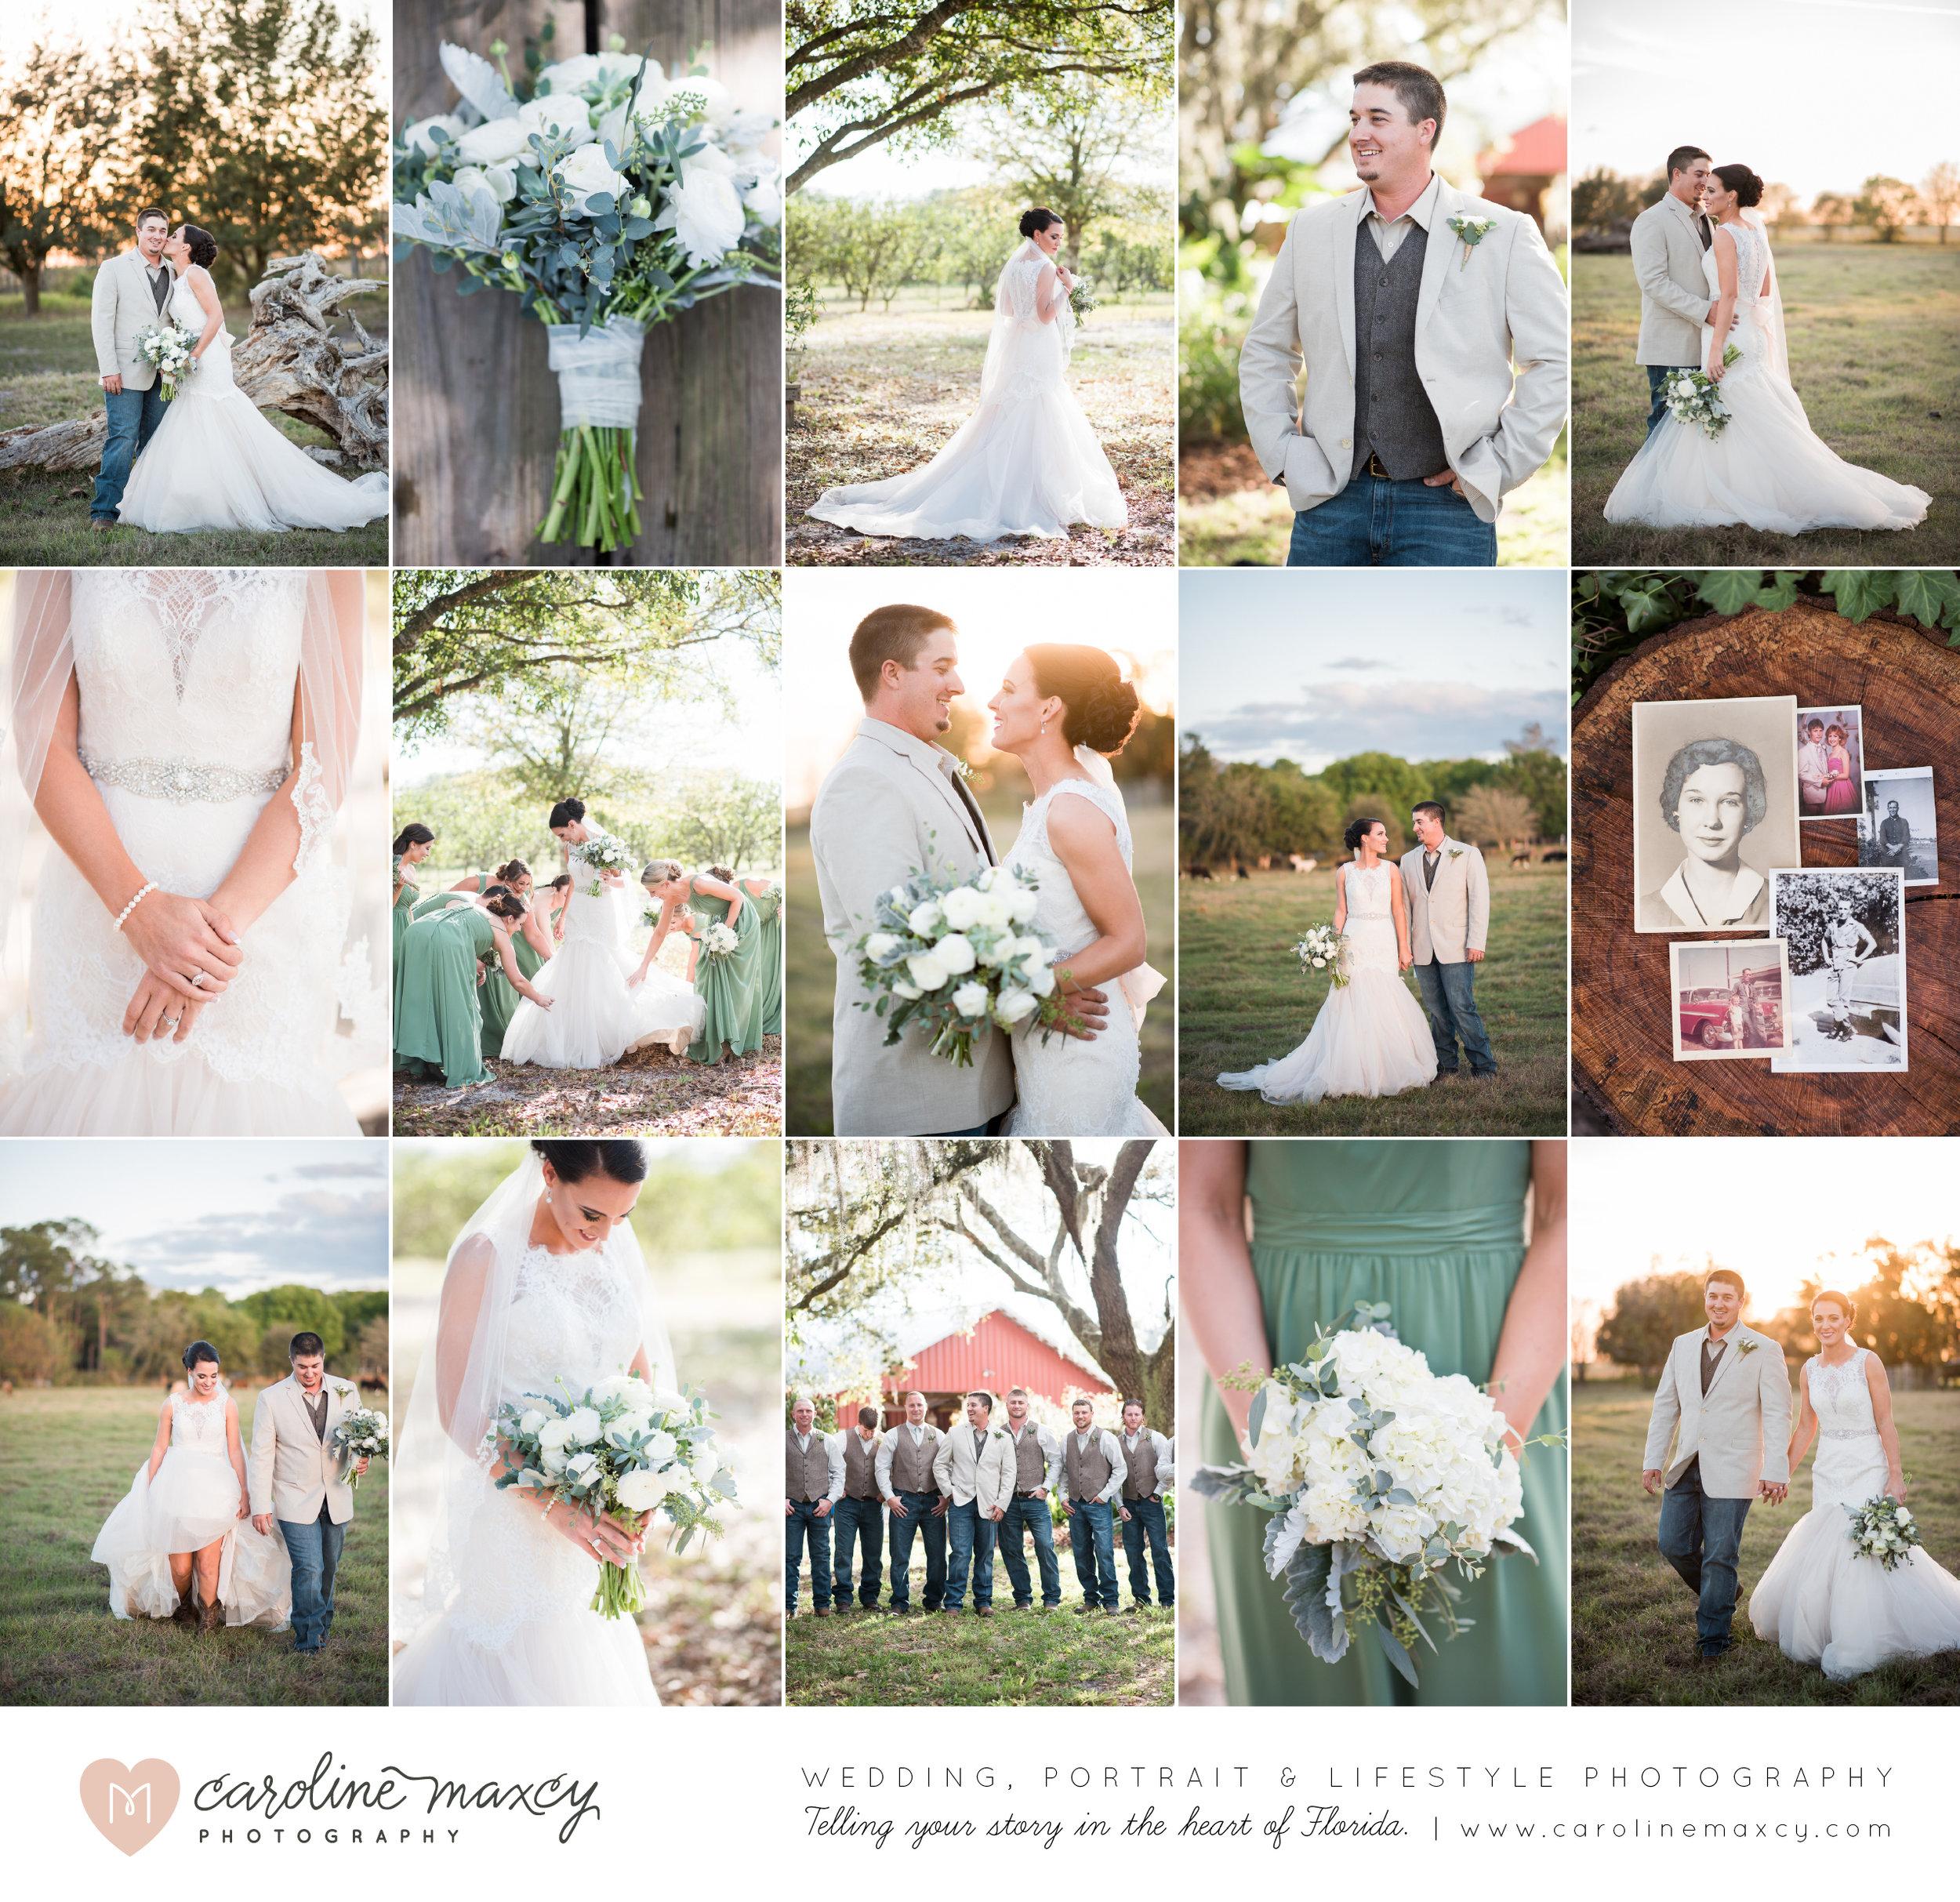 Heather + James — Avon Park, FL Wedding Photography with Caroline Maxcy Photography